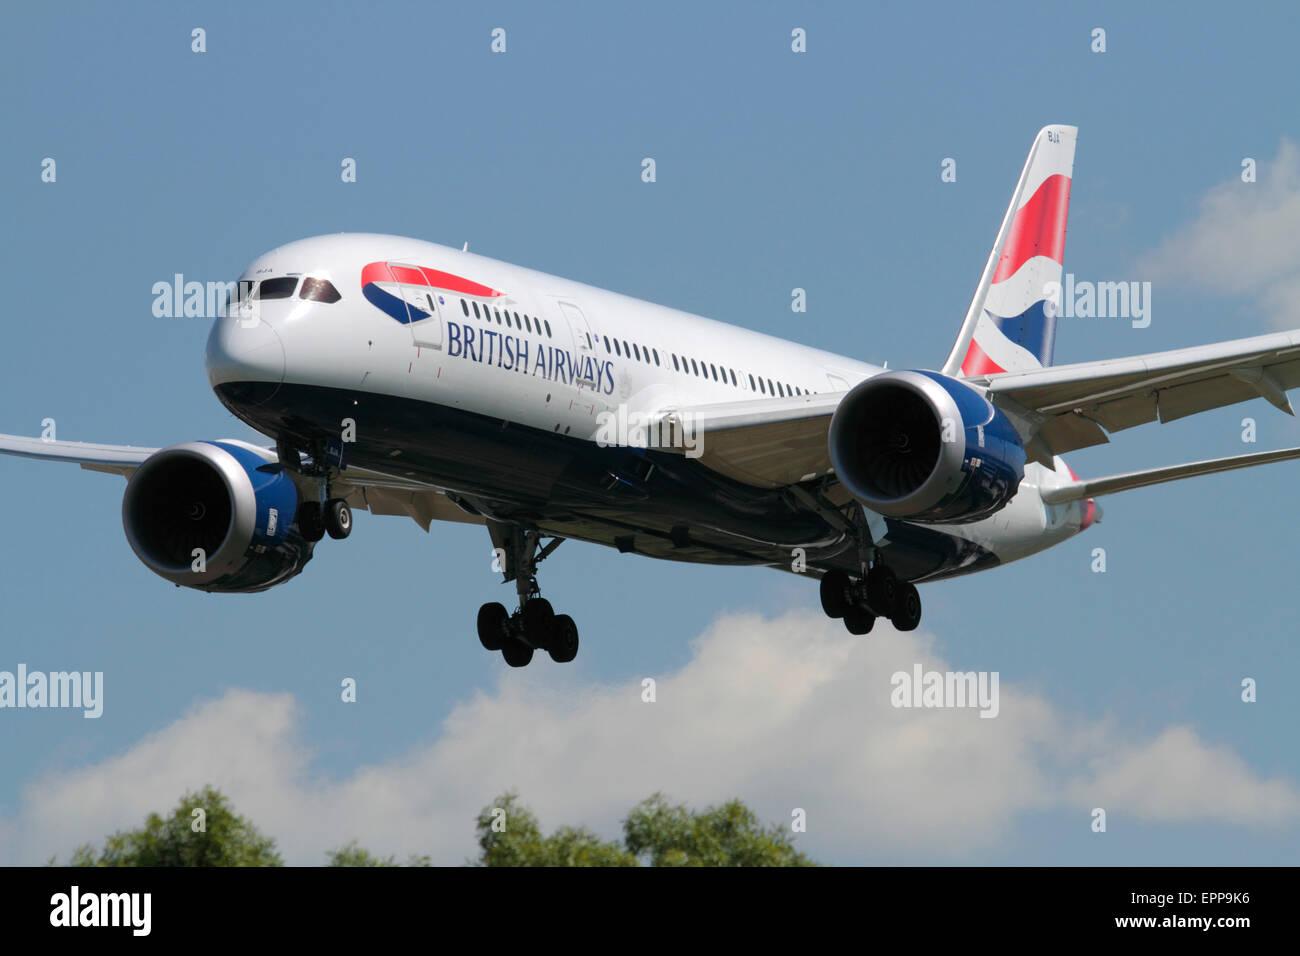 Long haul air travel. British Airways Boeing 787-8 Dreamliner passenger jet plane on approach to London Heathrow. - Stock Image